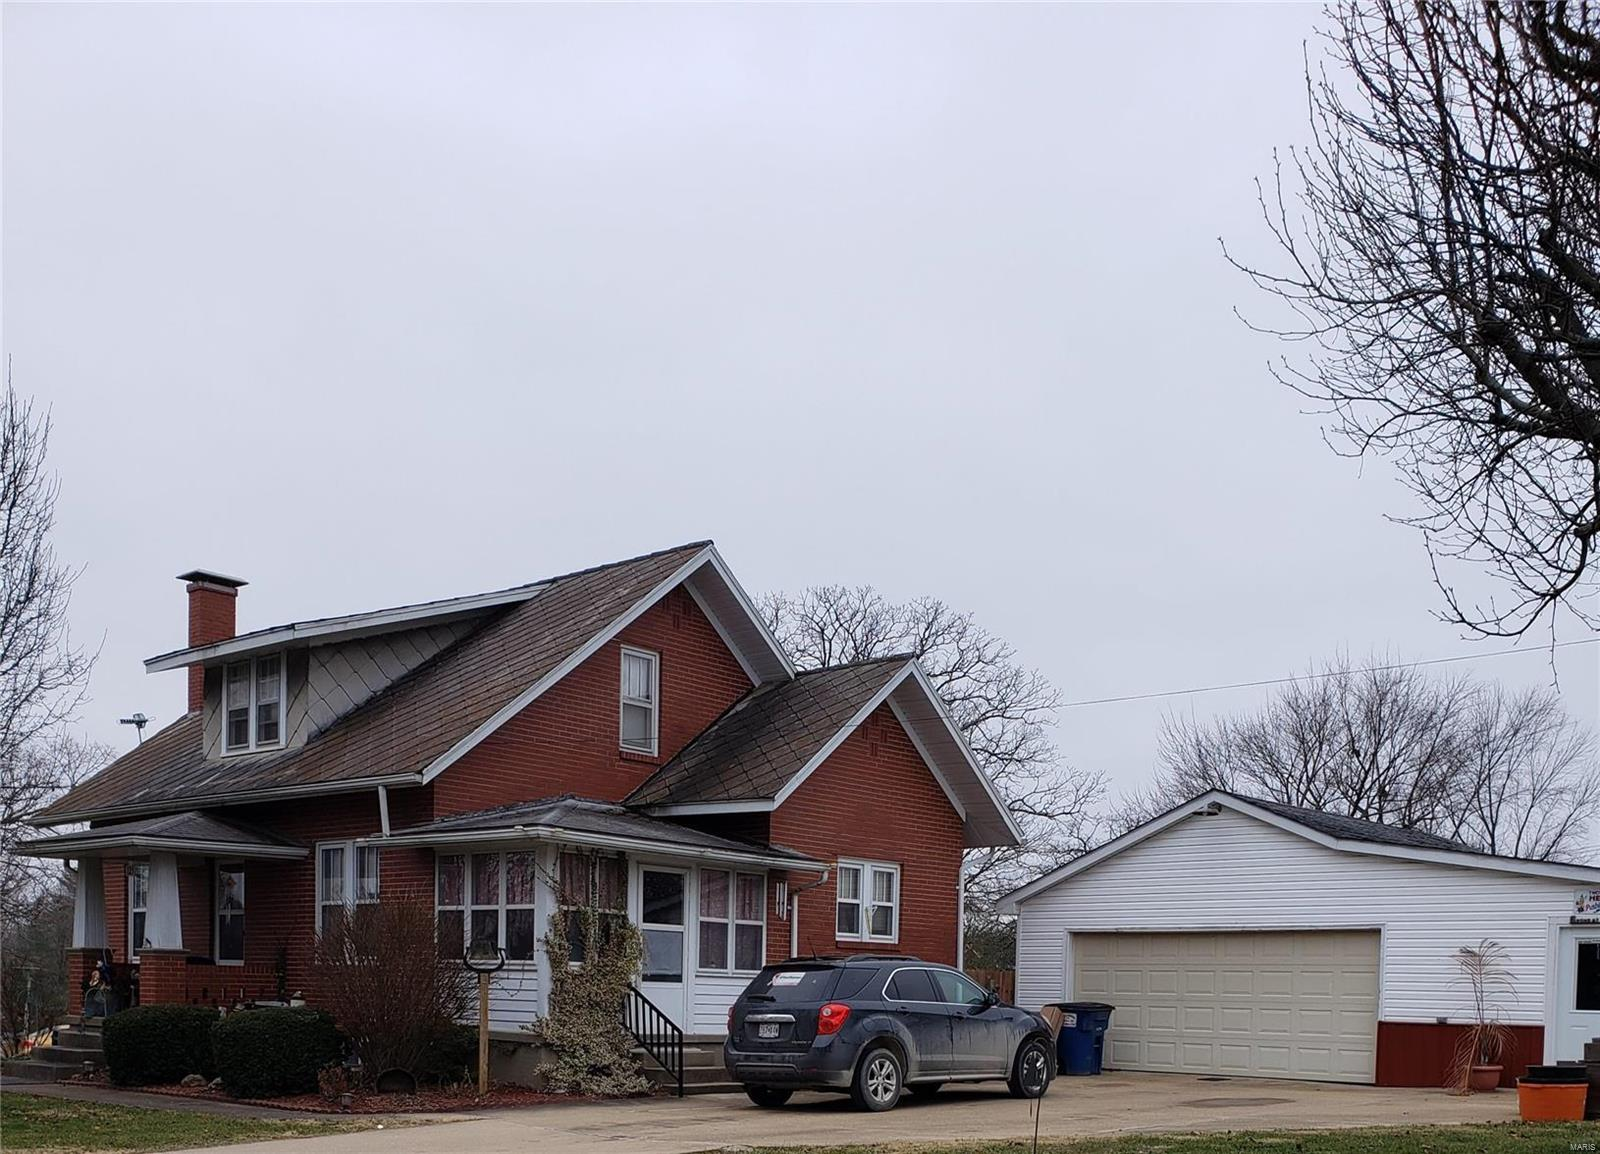 123 2nd Property Photo - Rosebud, MO real estate listing